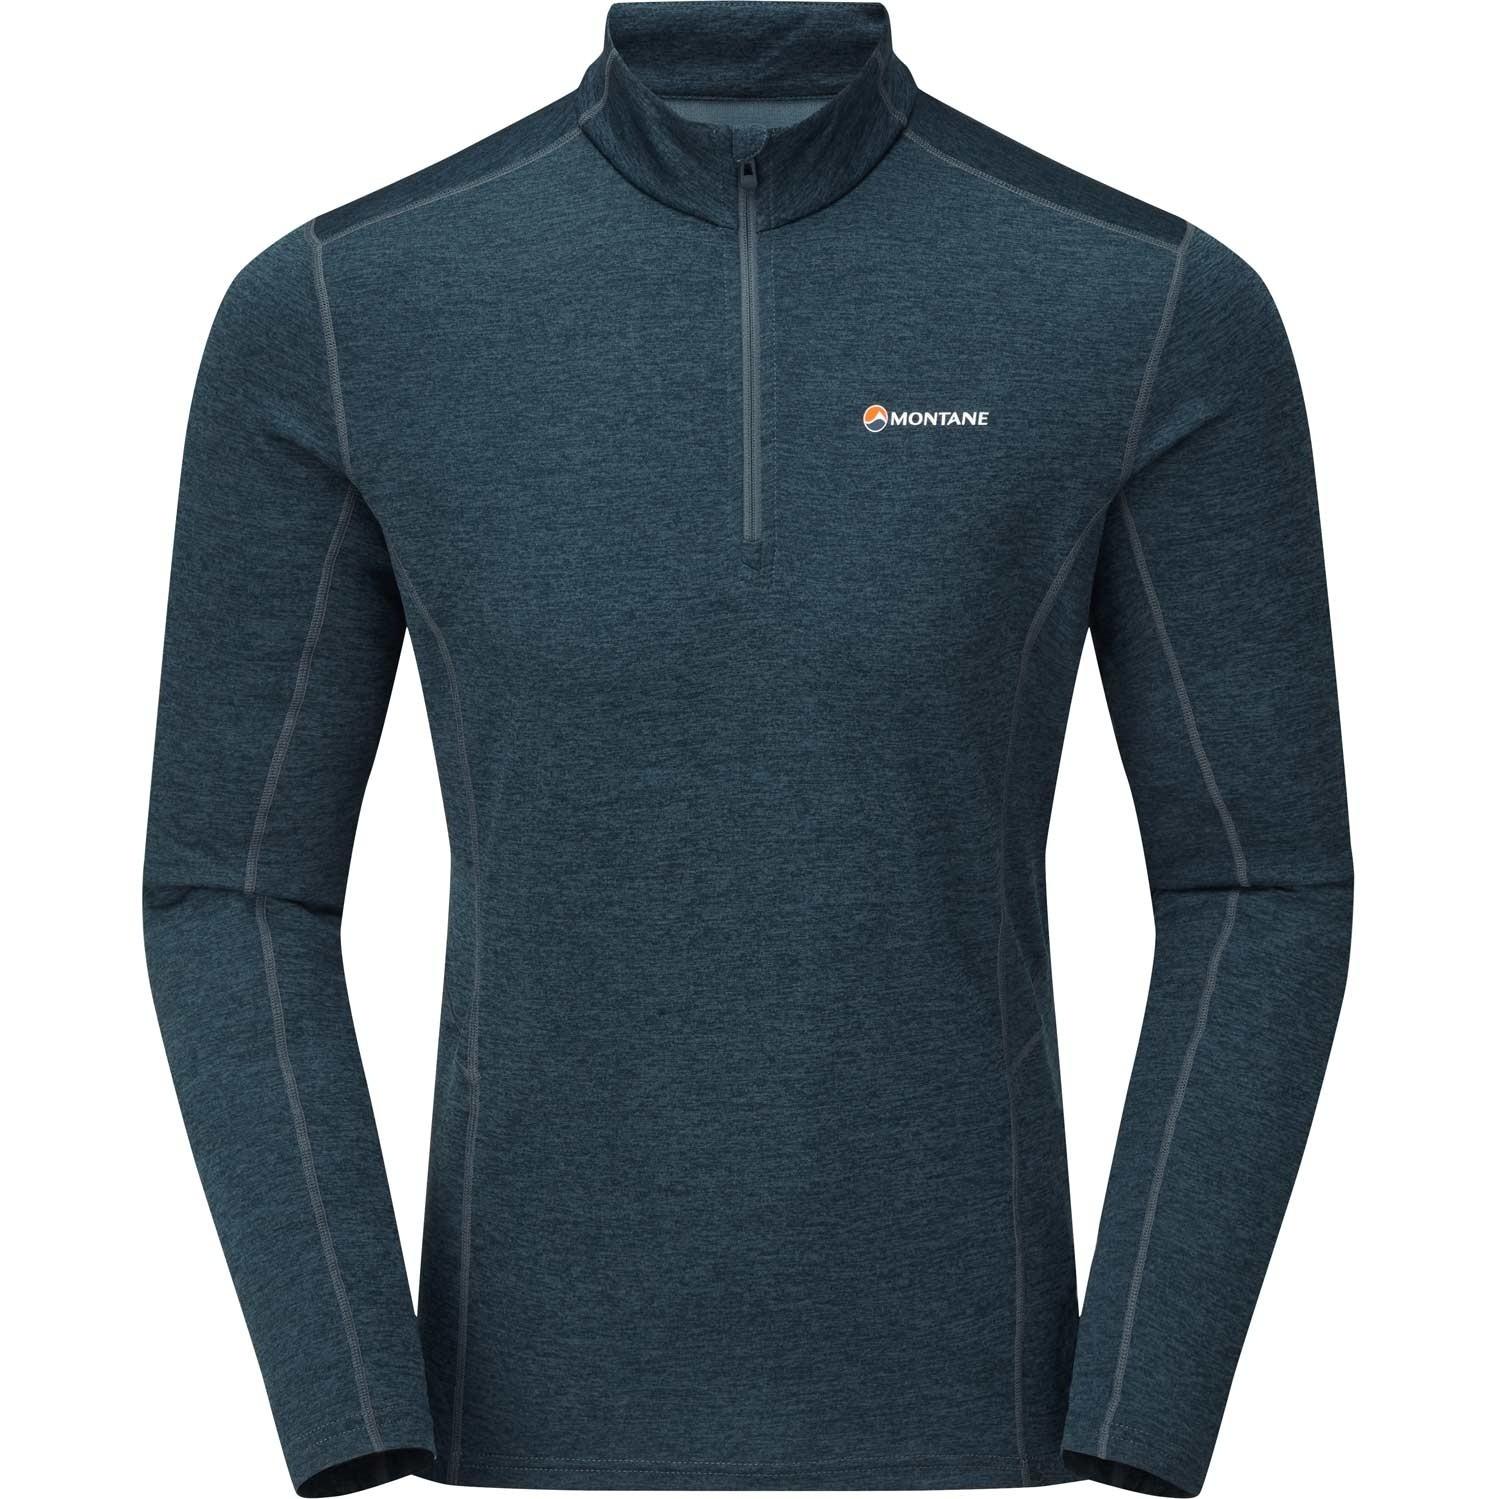 Montane Dart Zip-Neck T-shirt - Men's - Orion Blue